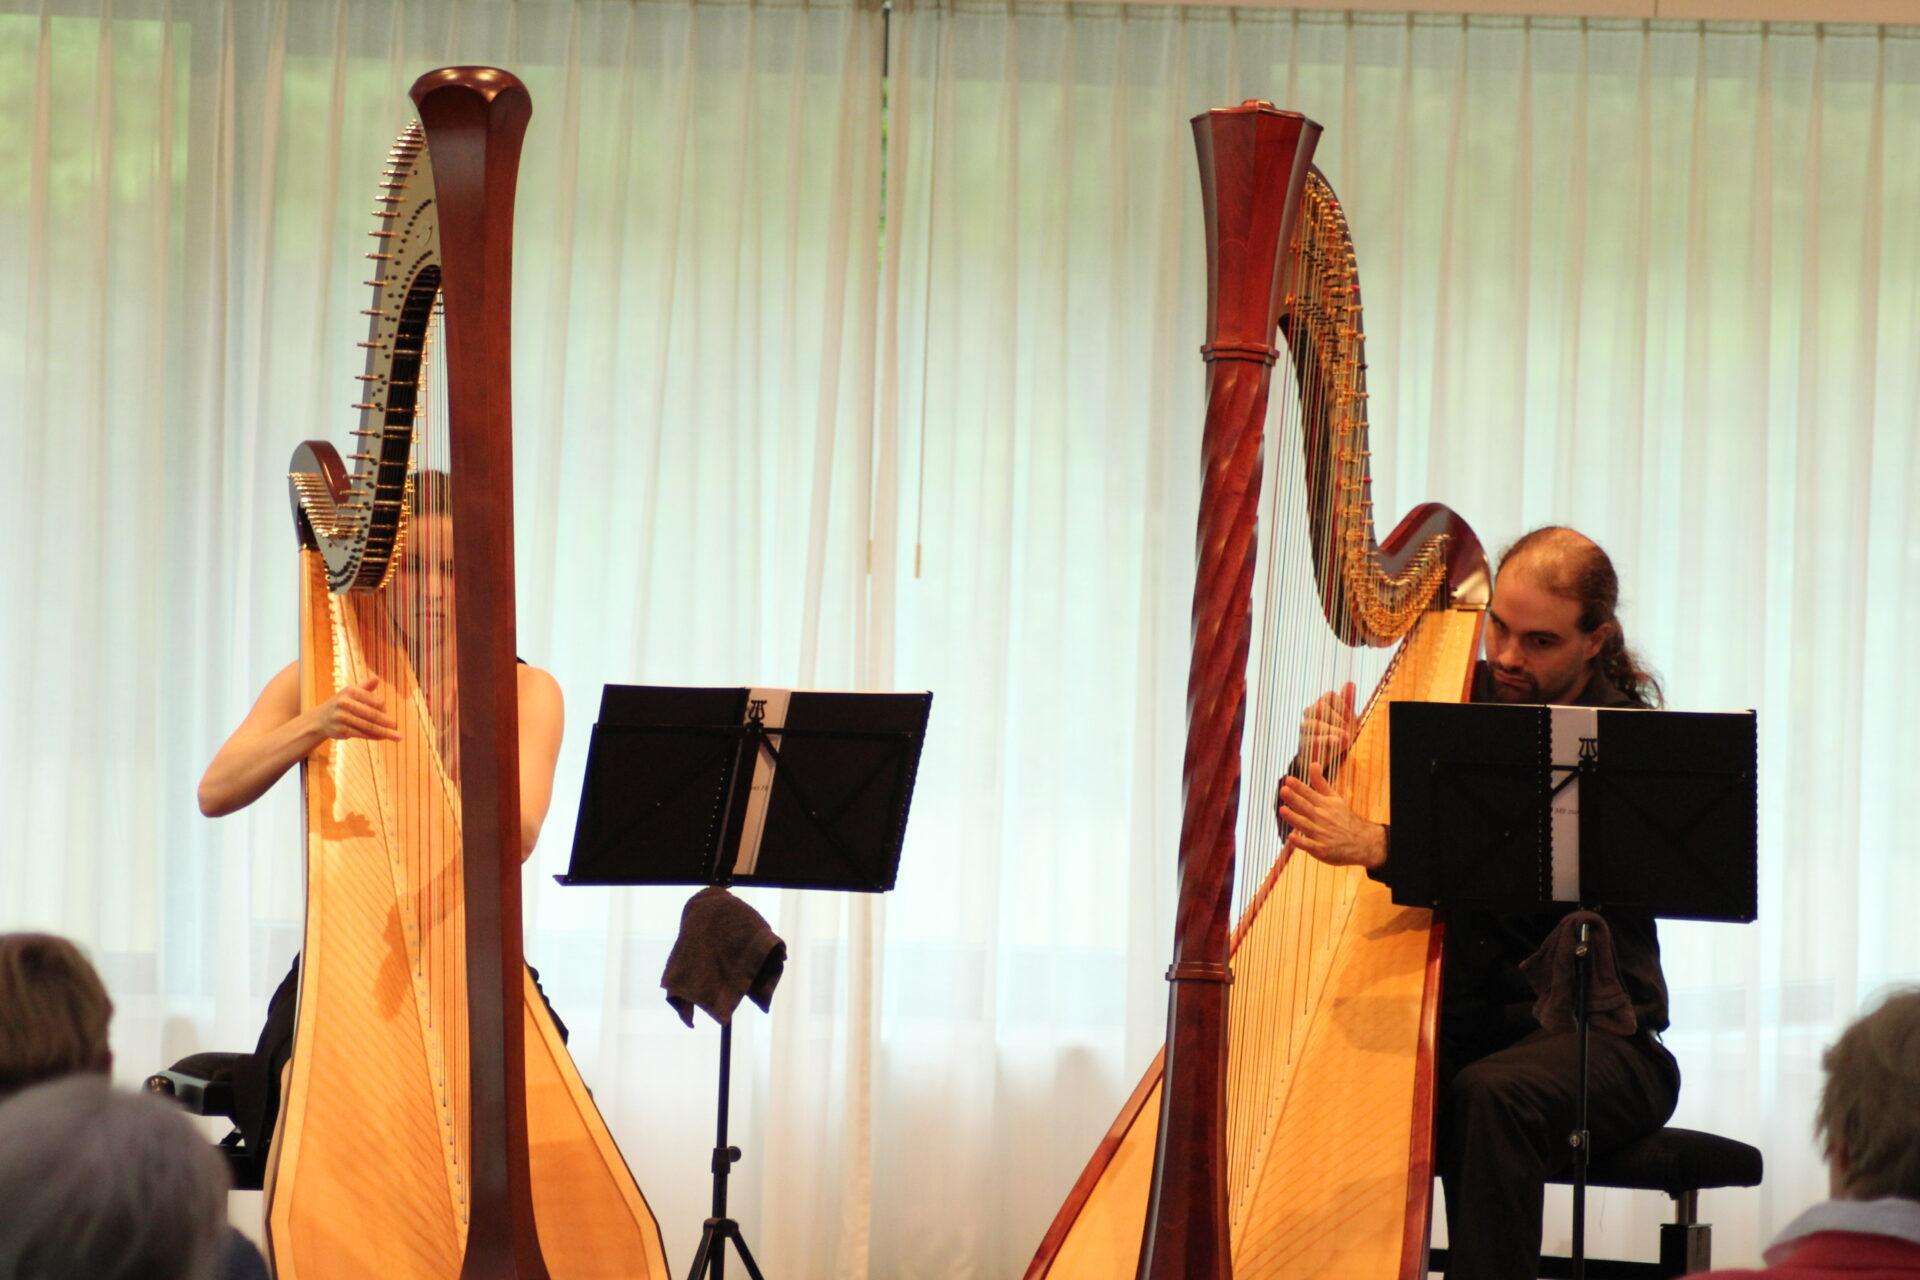 Kultur trotz Corona: Konzertgesellschaft veranstaltet Sommerkonzerte